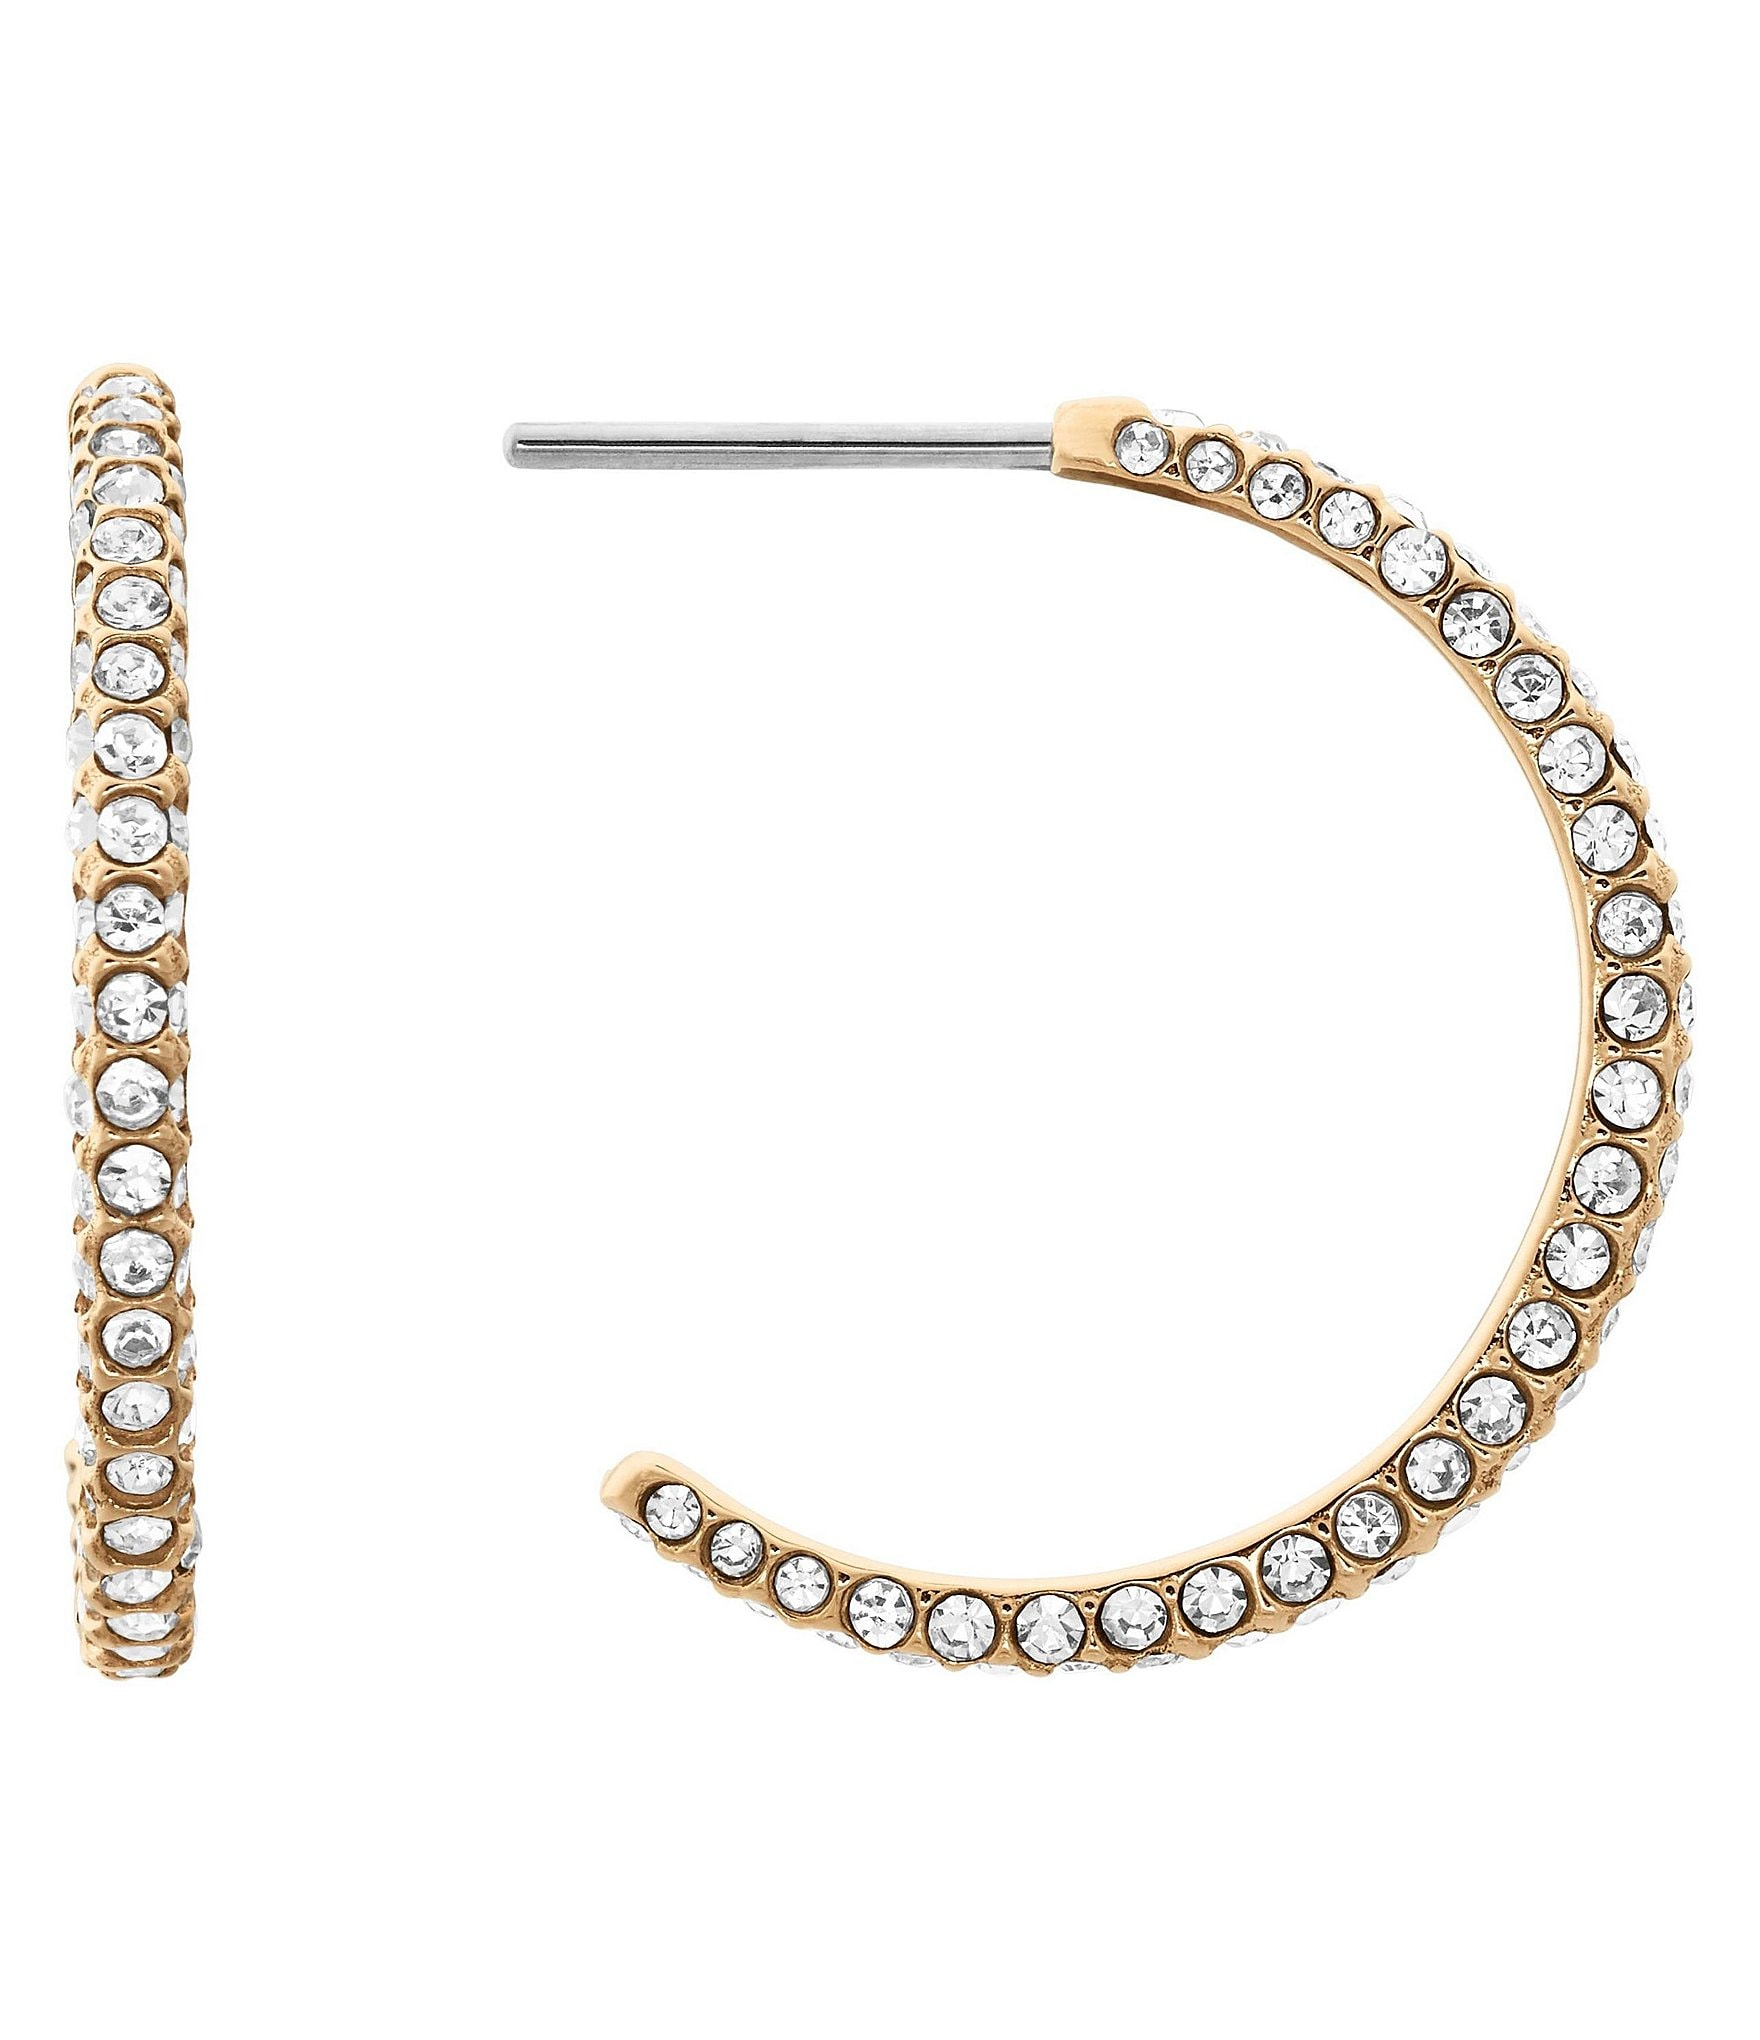 michael kors beyond brilliant celestial hoop earrings. Black Bedroom Furniture Sets. Home Design Ideas